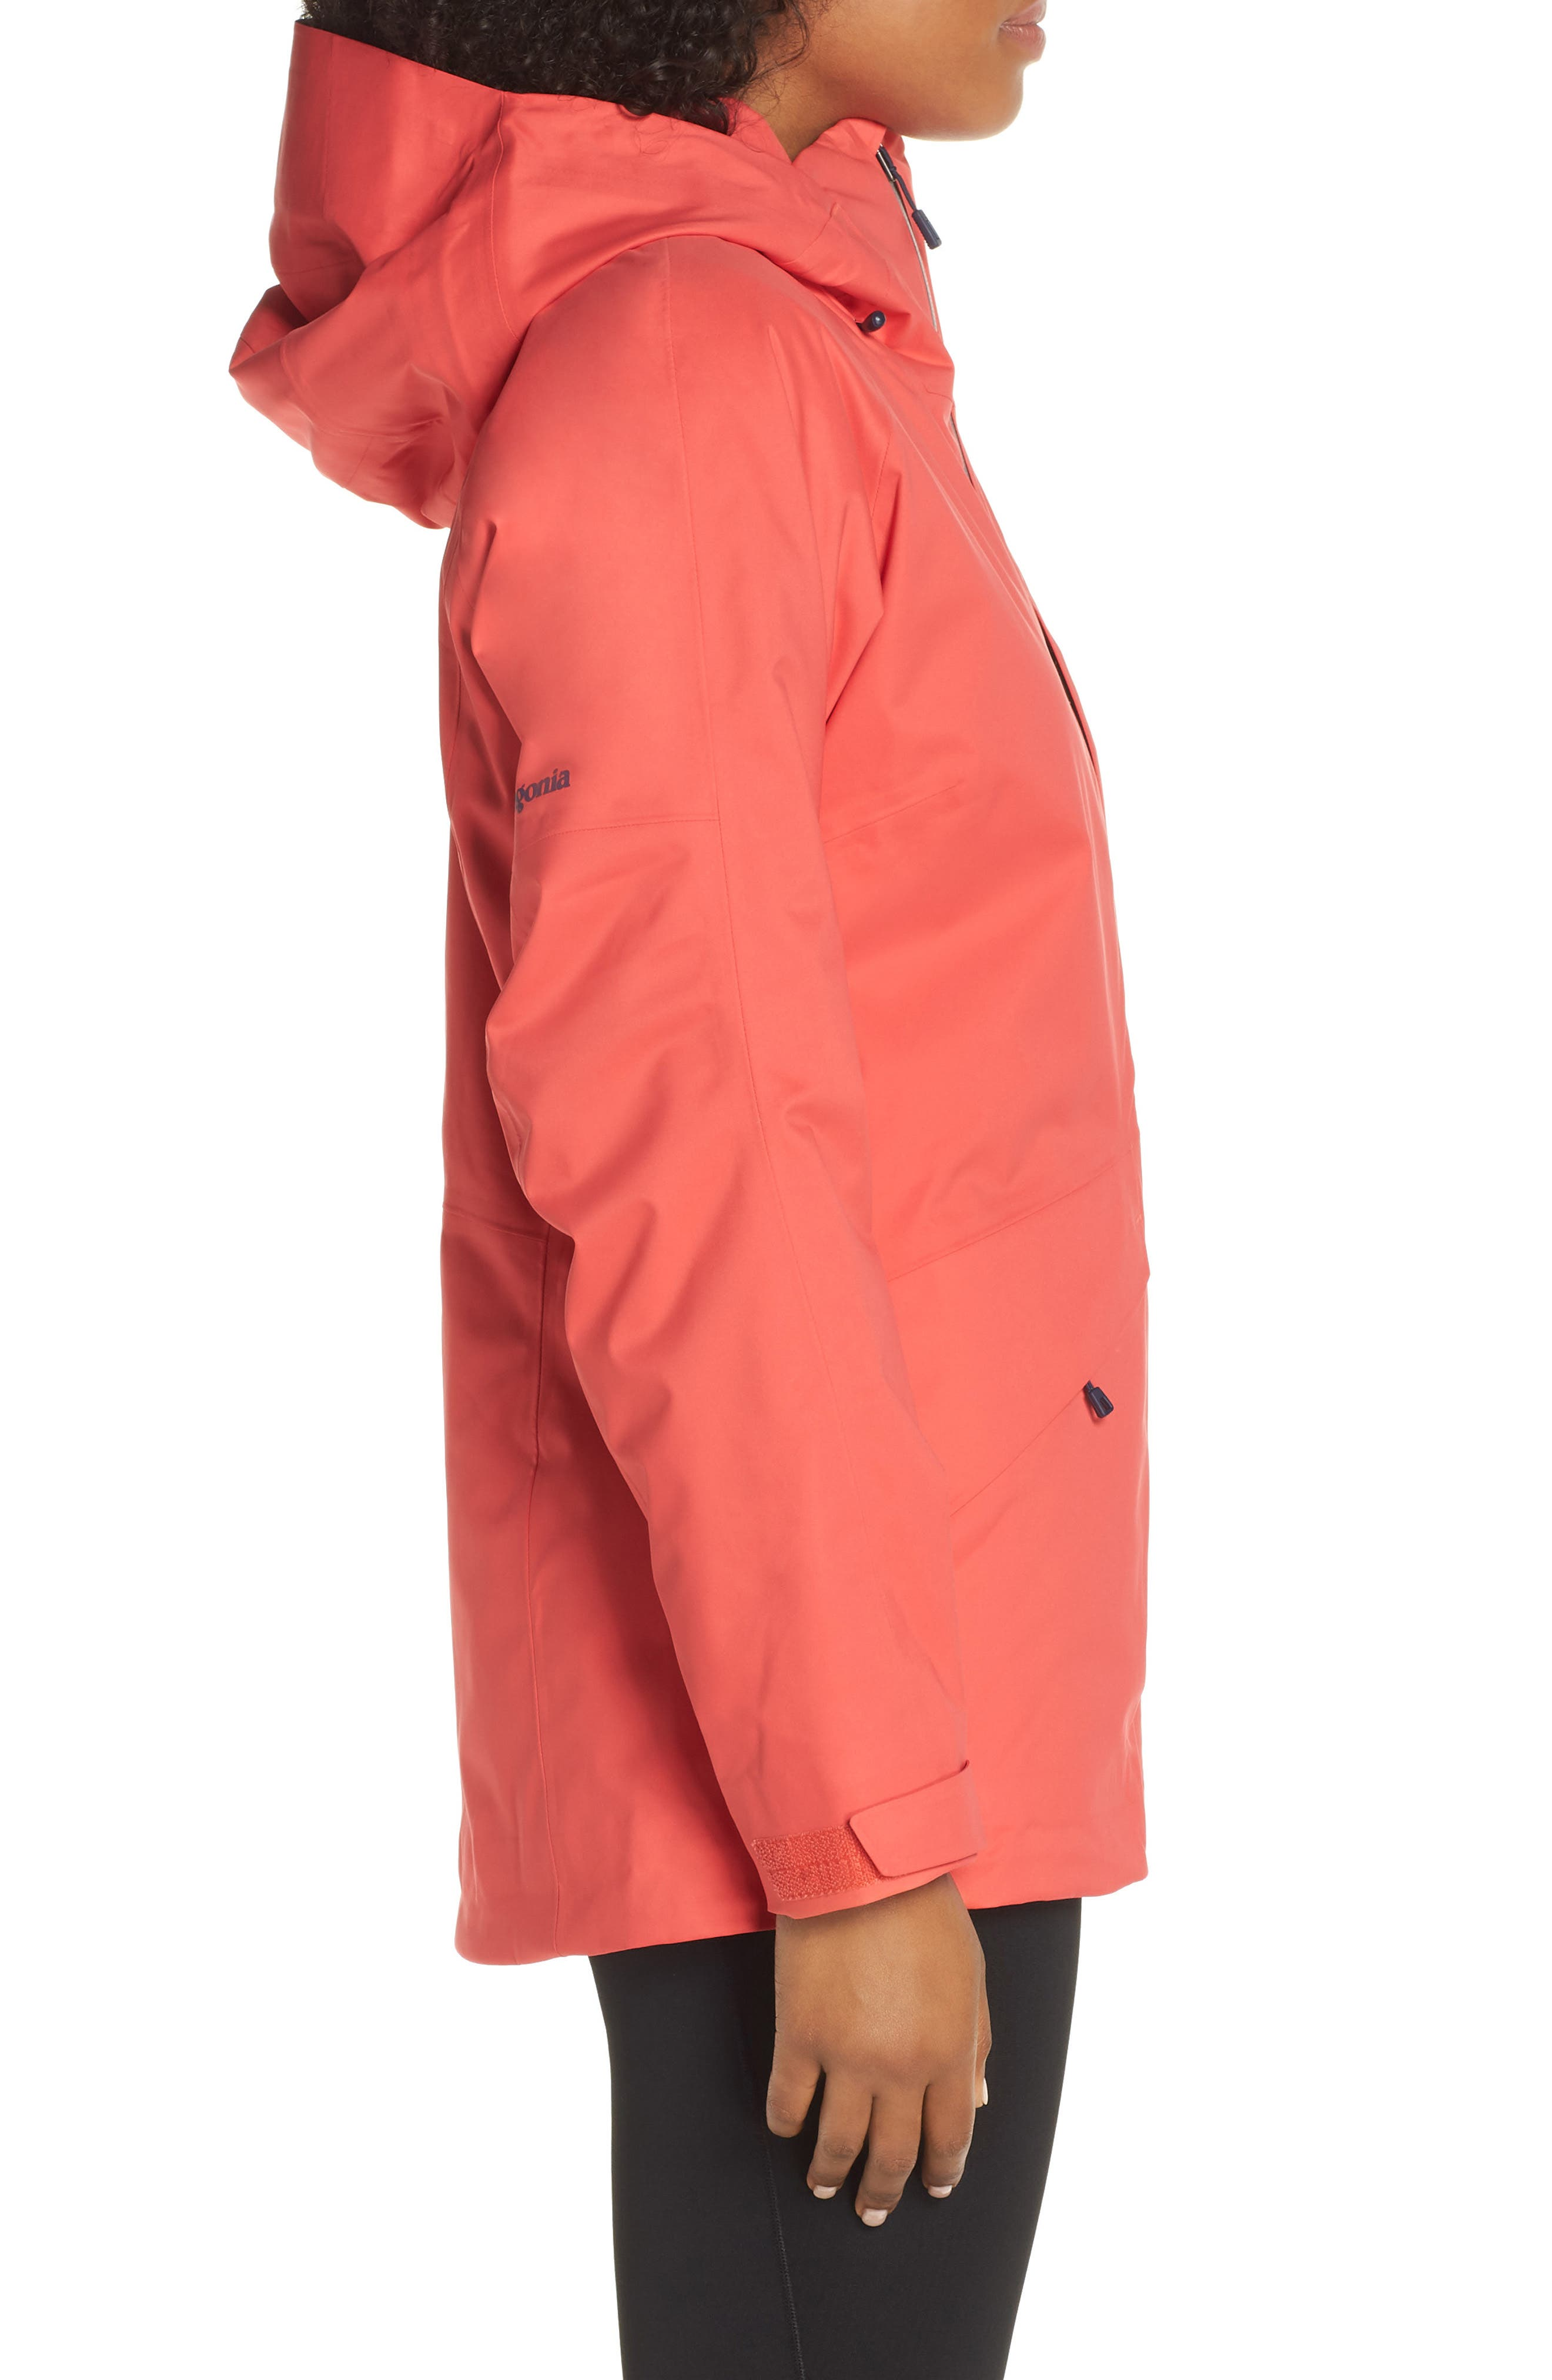 PATAGONIA,                             Snowbelle Insulated Ski Jacket,                             Alternate thumbnail 3, color,                             601